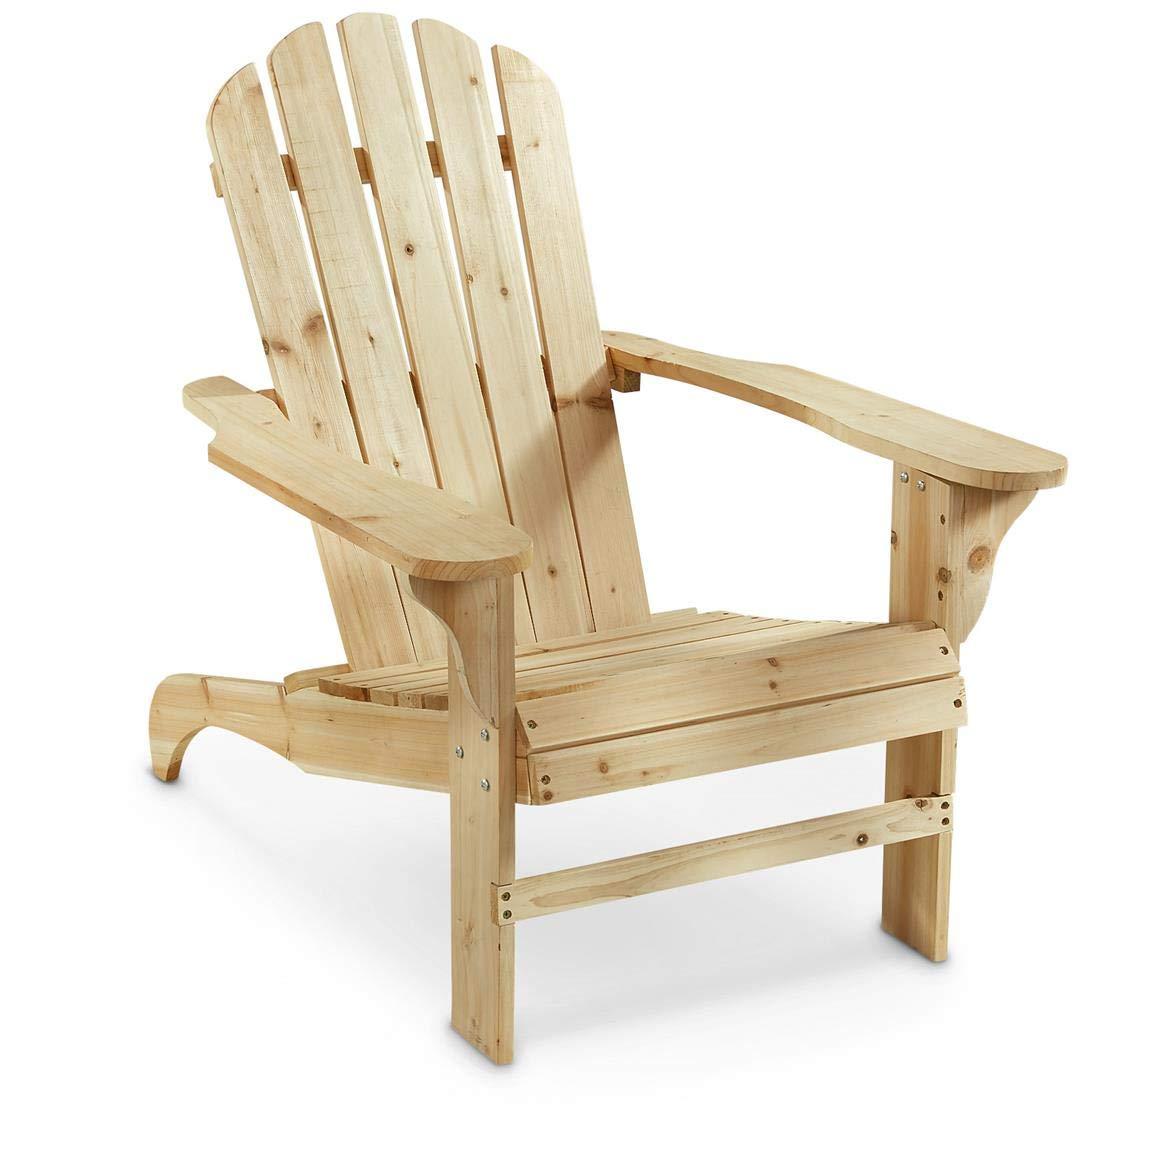 CASTLECREEK Adirondack Chair, 250-lb. Capacity by CASTLECREEK